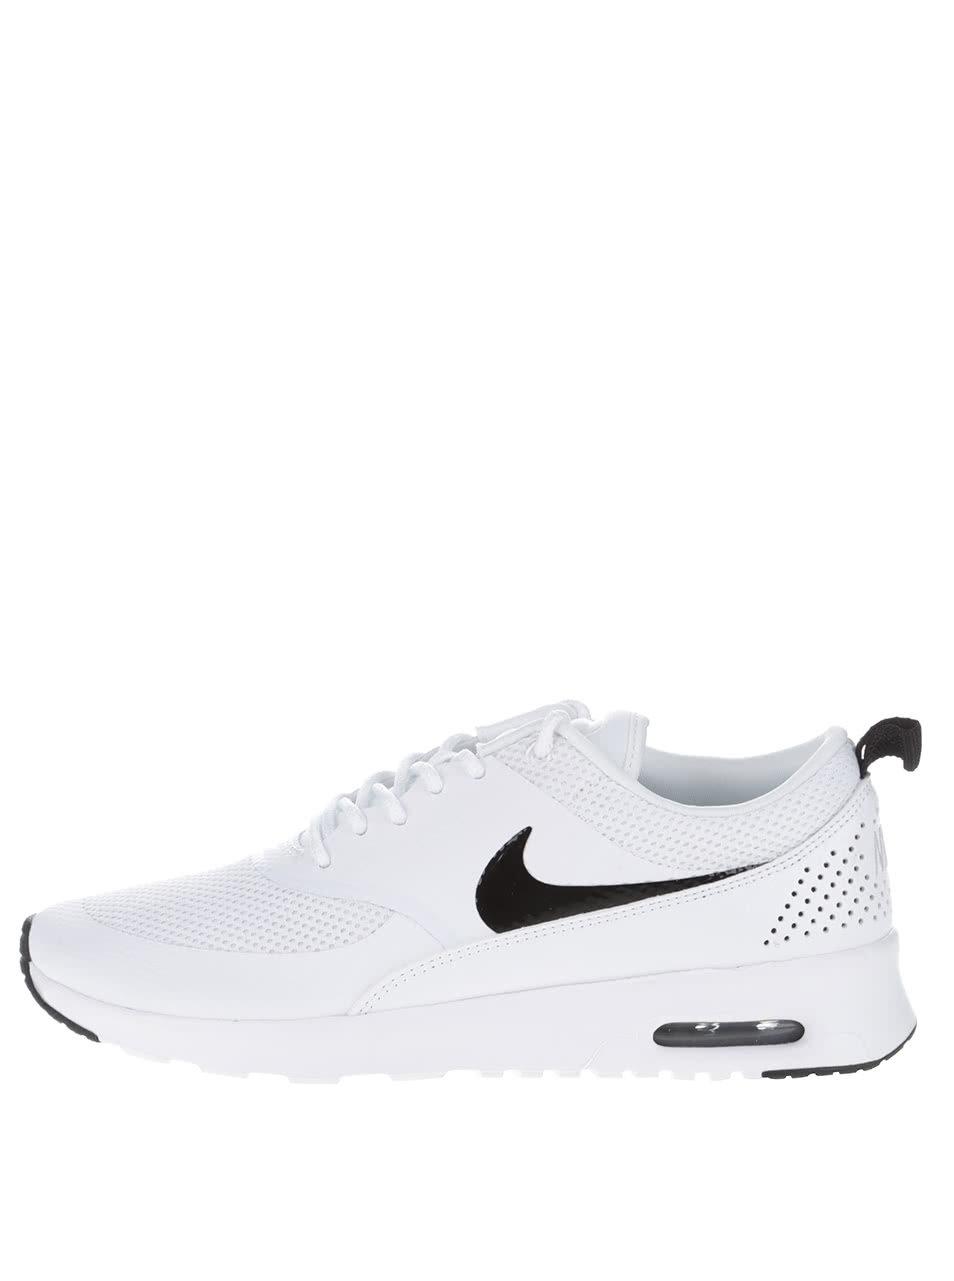 Bílé dámské tenisky Nike Air Max ... 9680ed2d6a